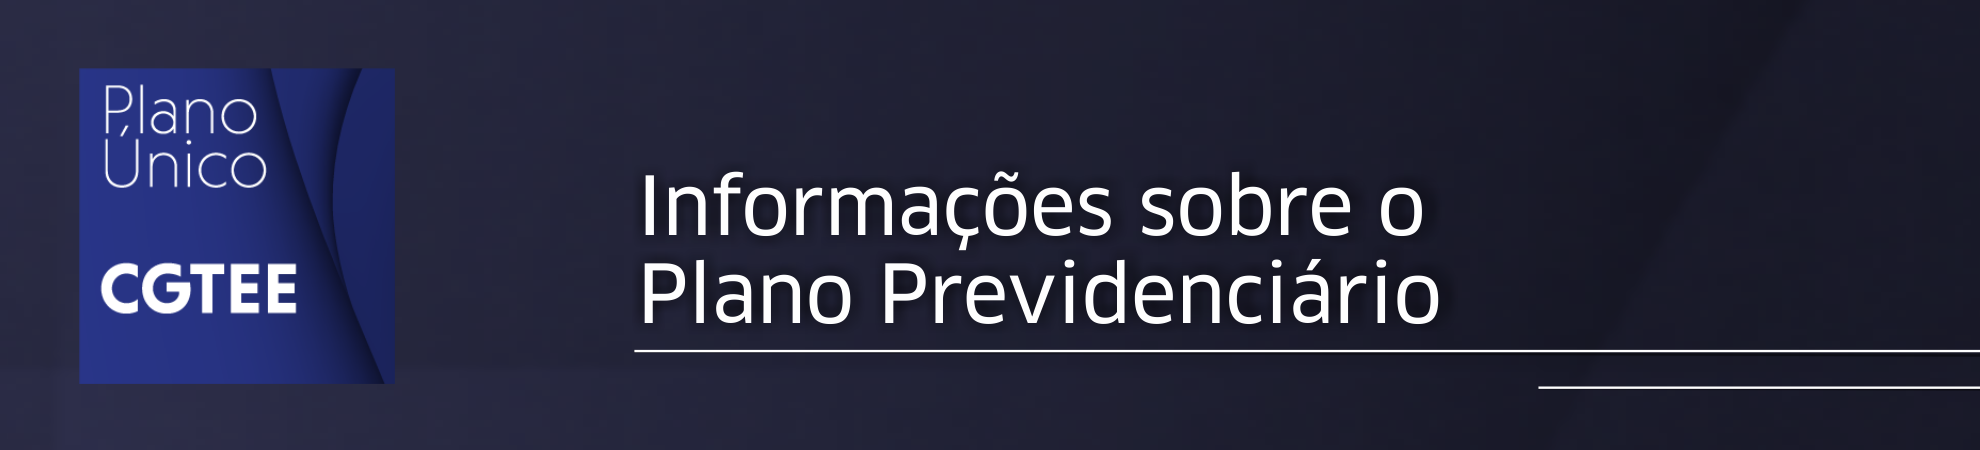 cabecalho_informacoes_cgtee